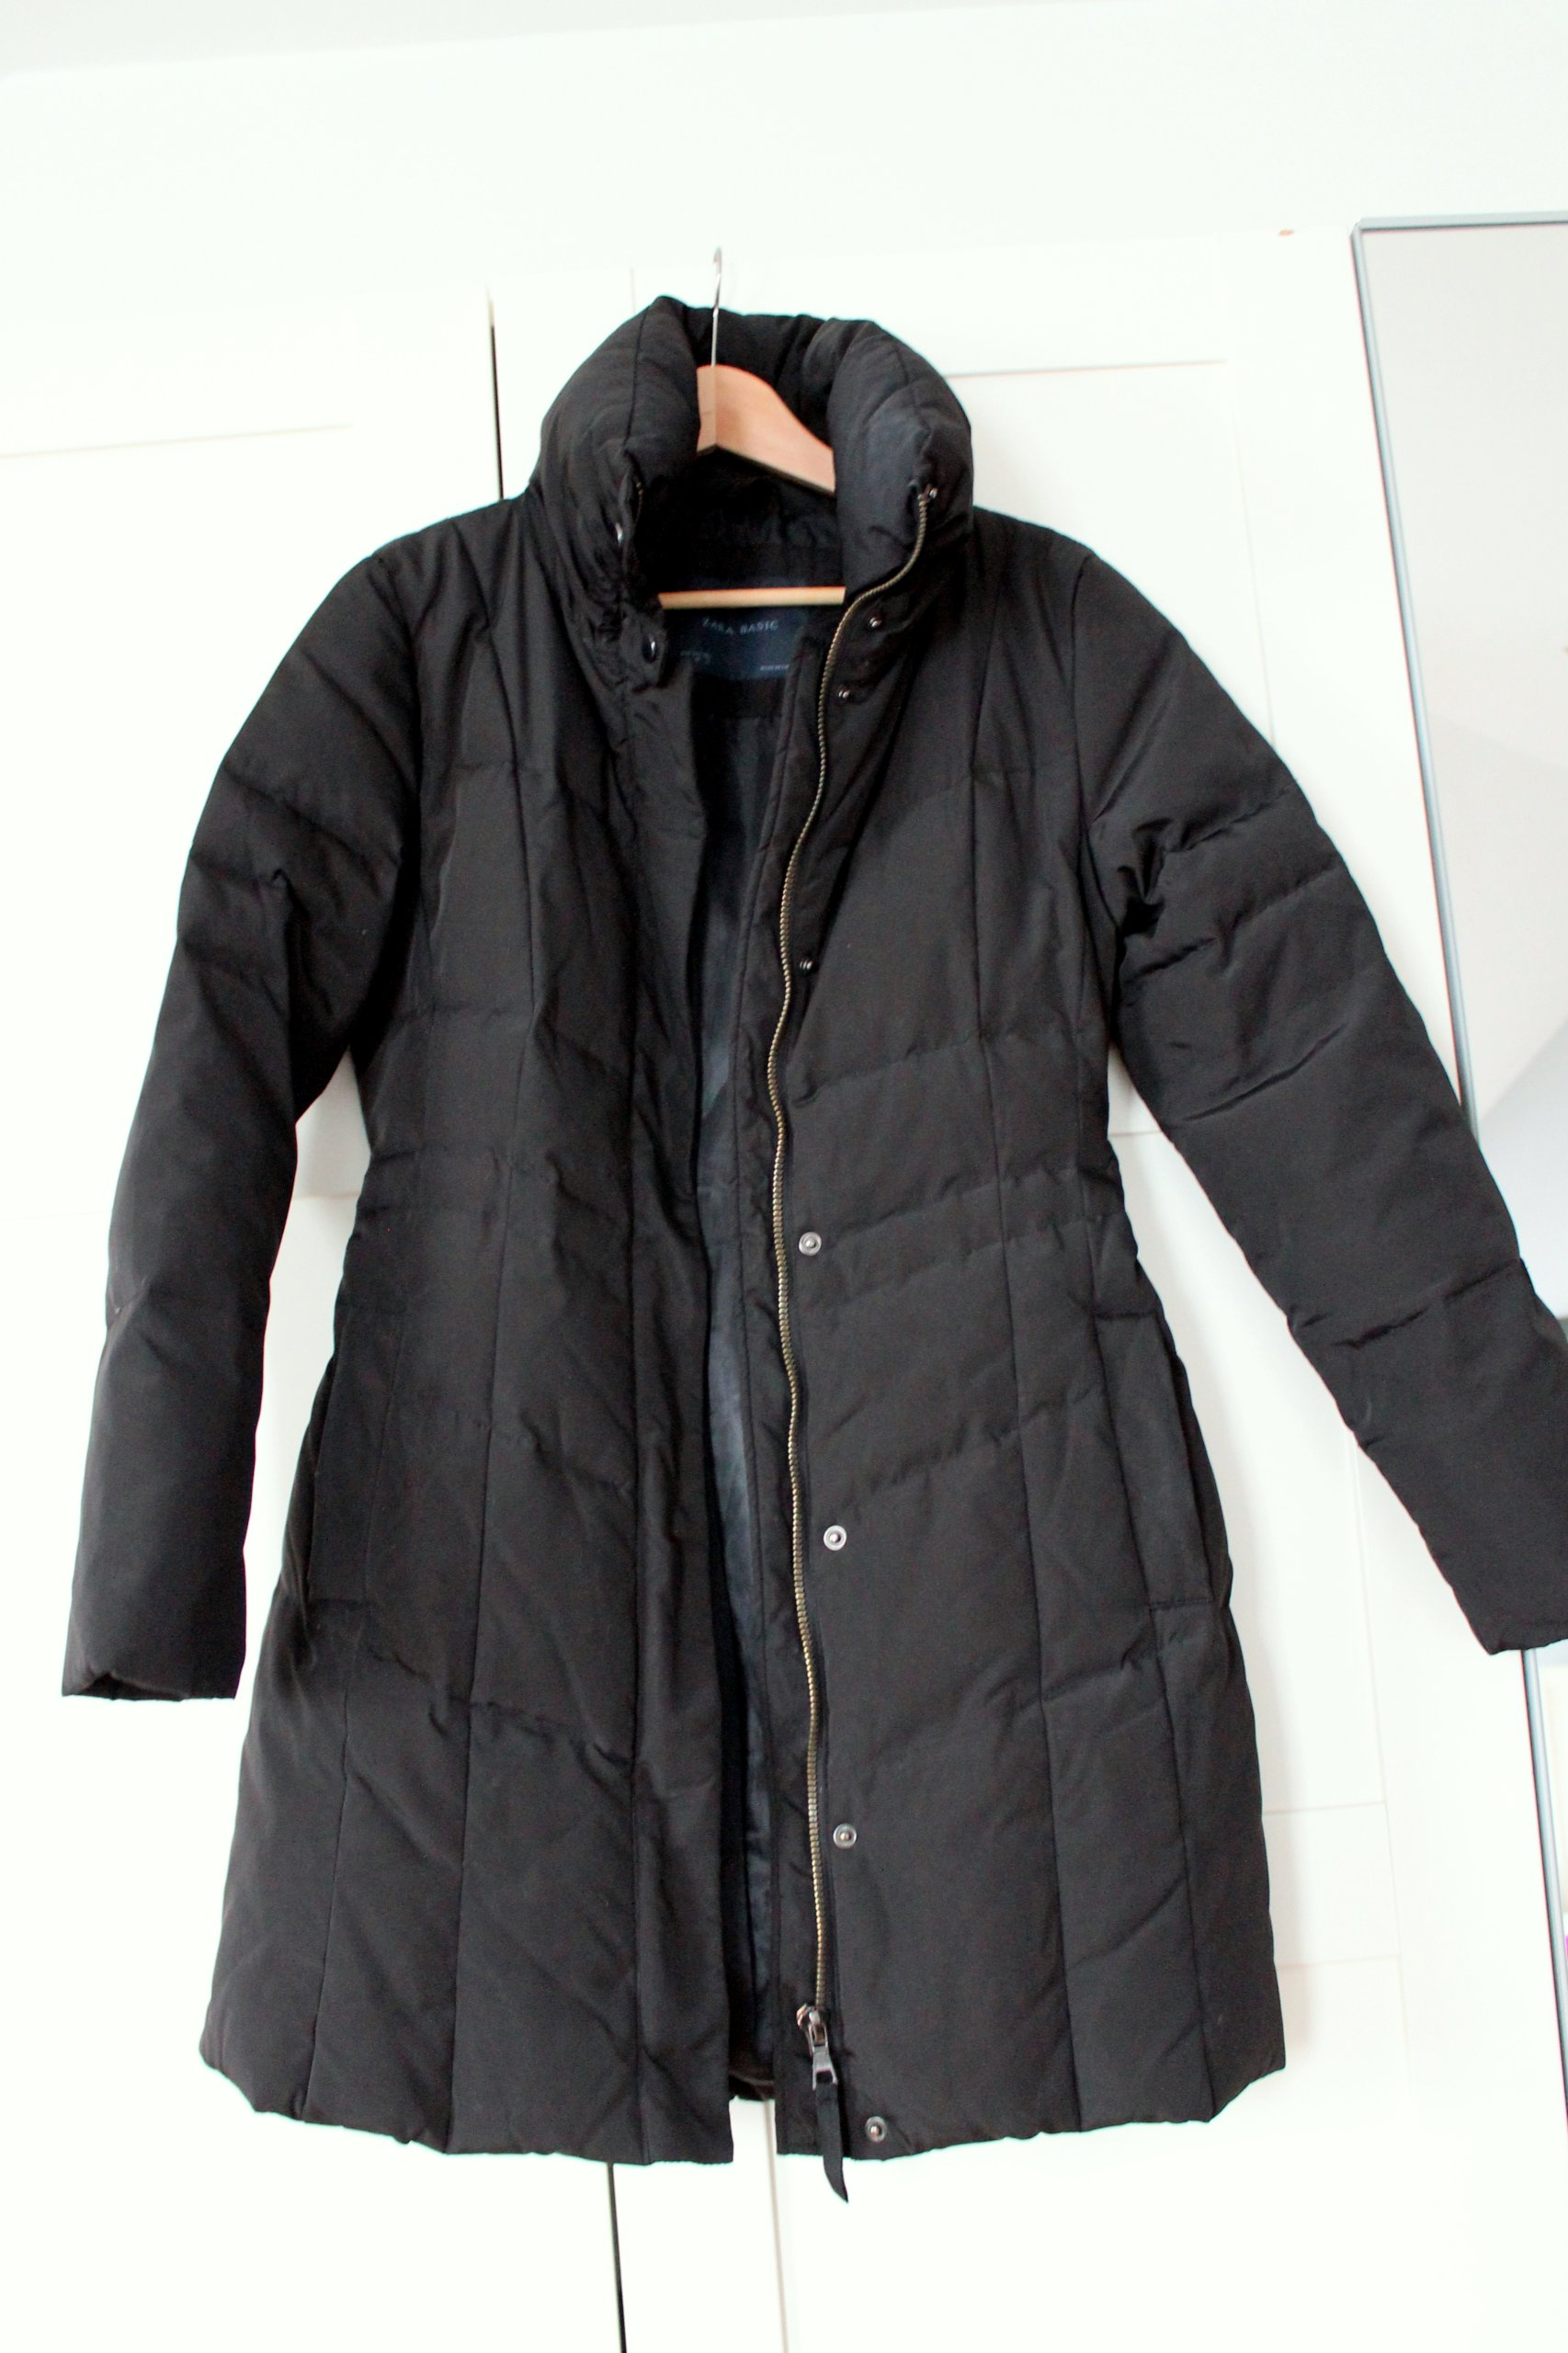 f3ee03c7e4ac02 Czarna kurtka zimowa puchowa ZARA damska M 38 - 7161925853 ...